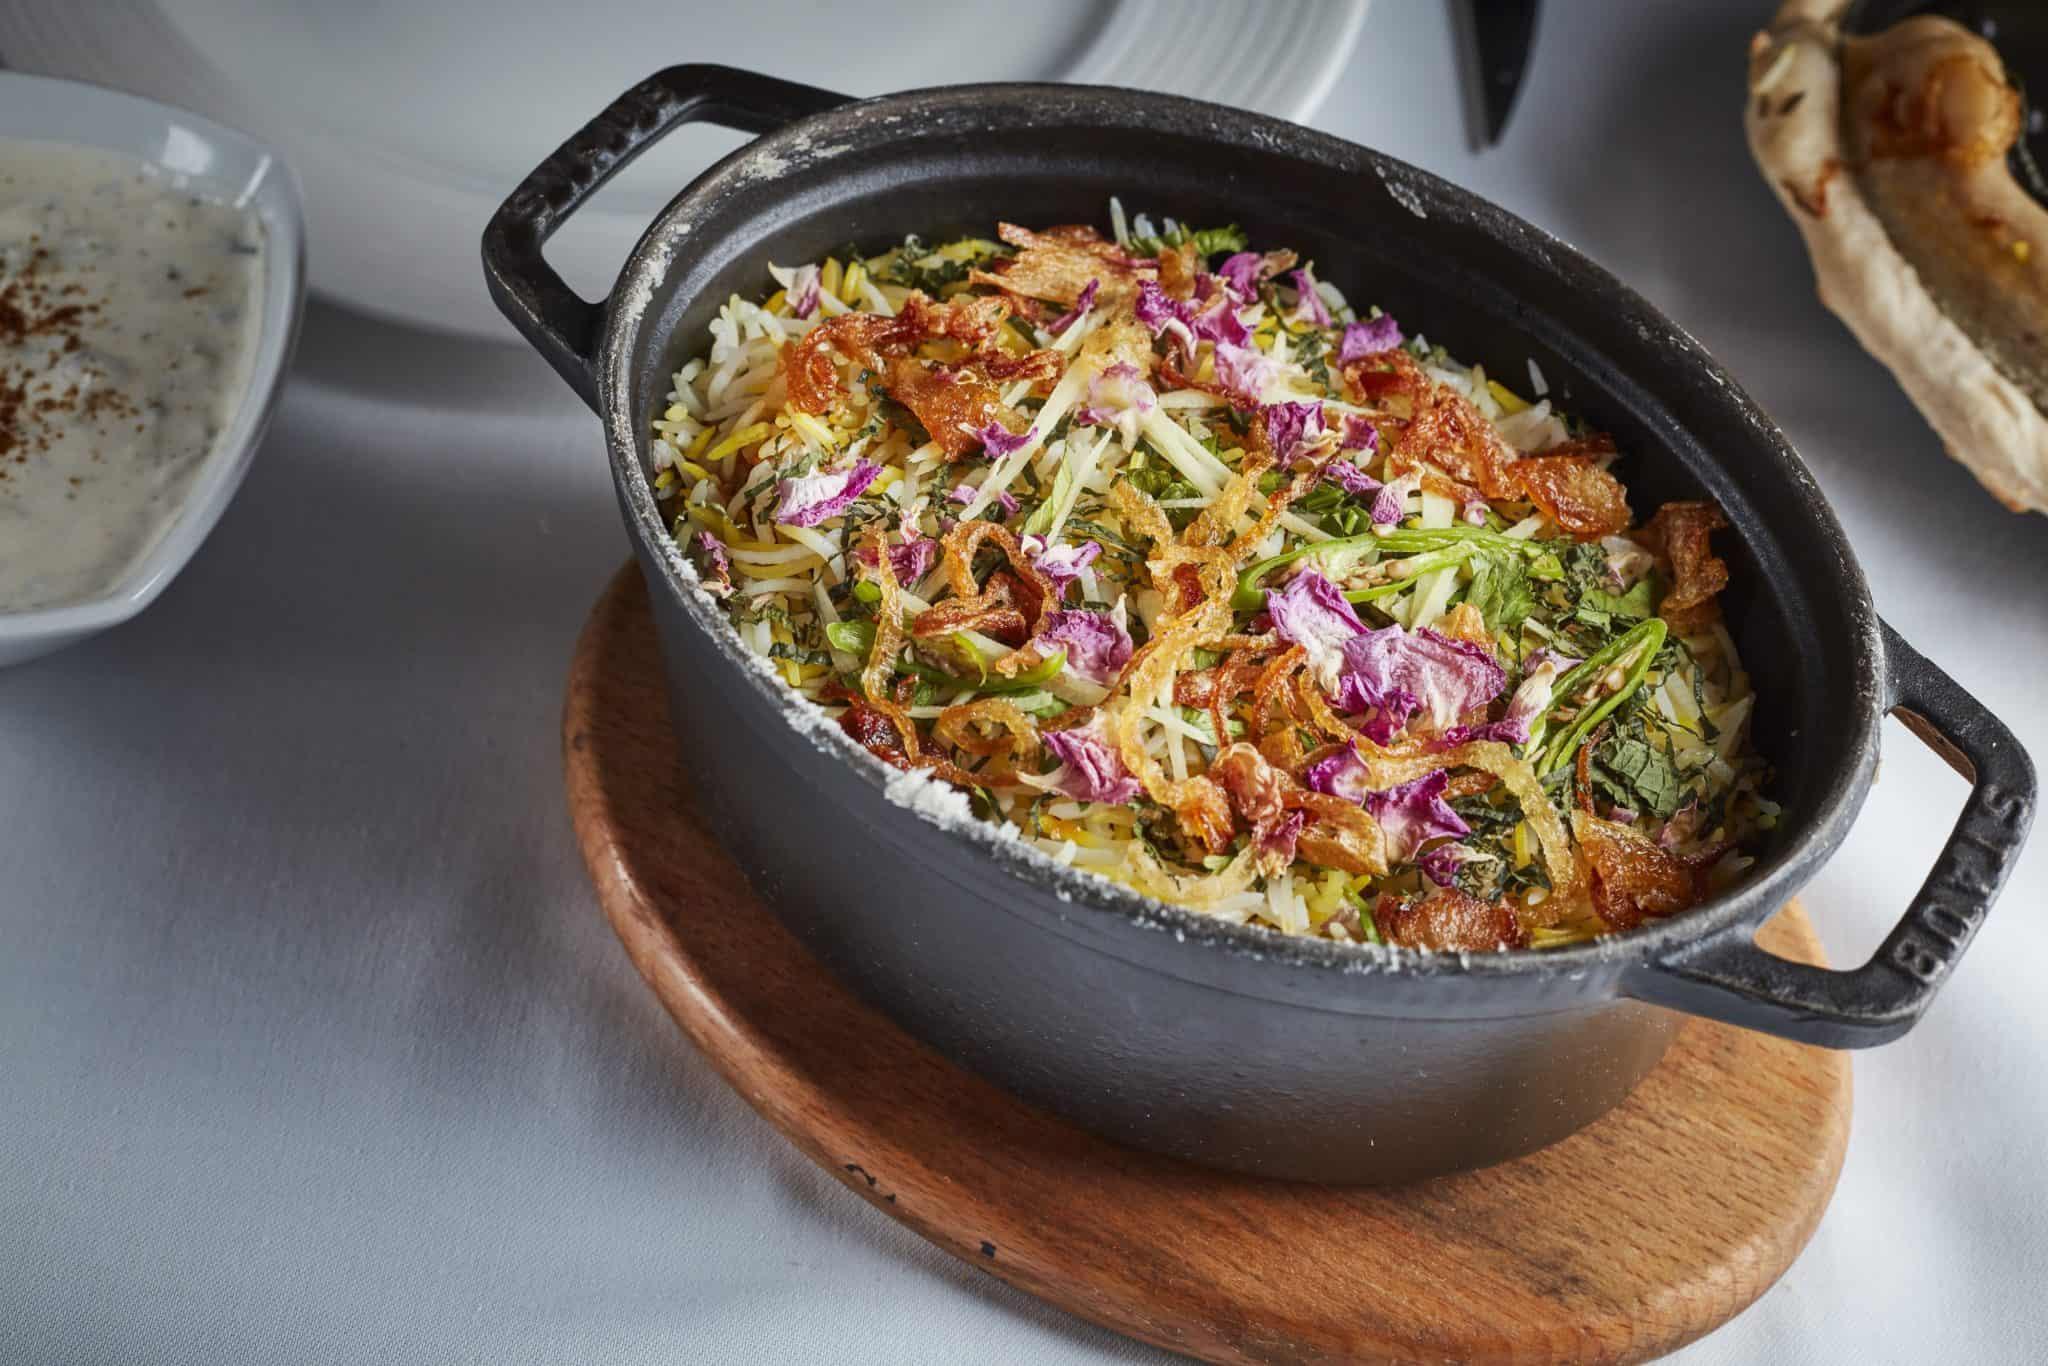 Benares  London's best Restaurants reopening 17th May indoor dining